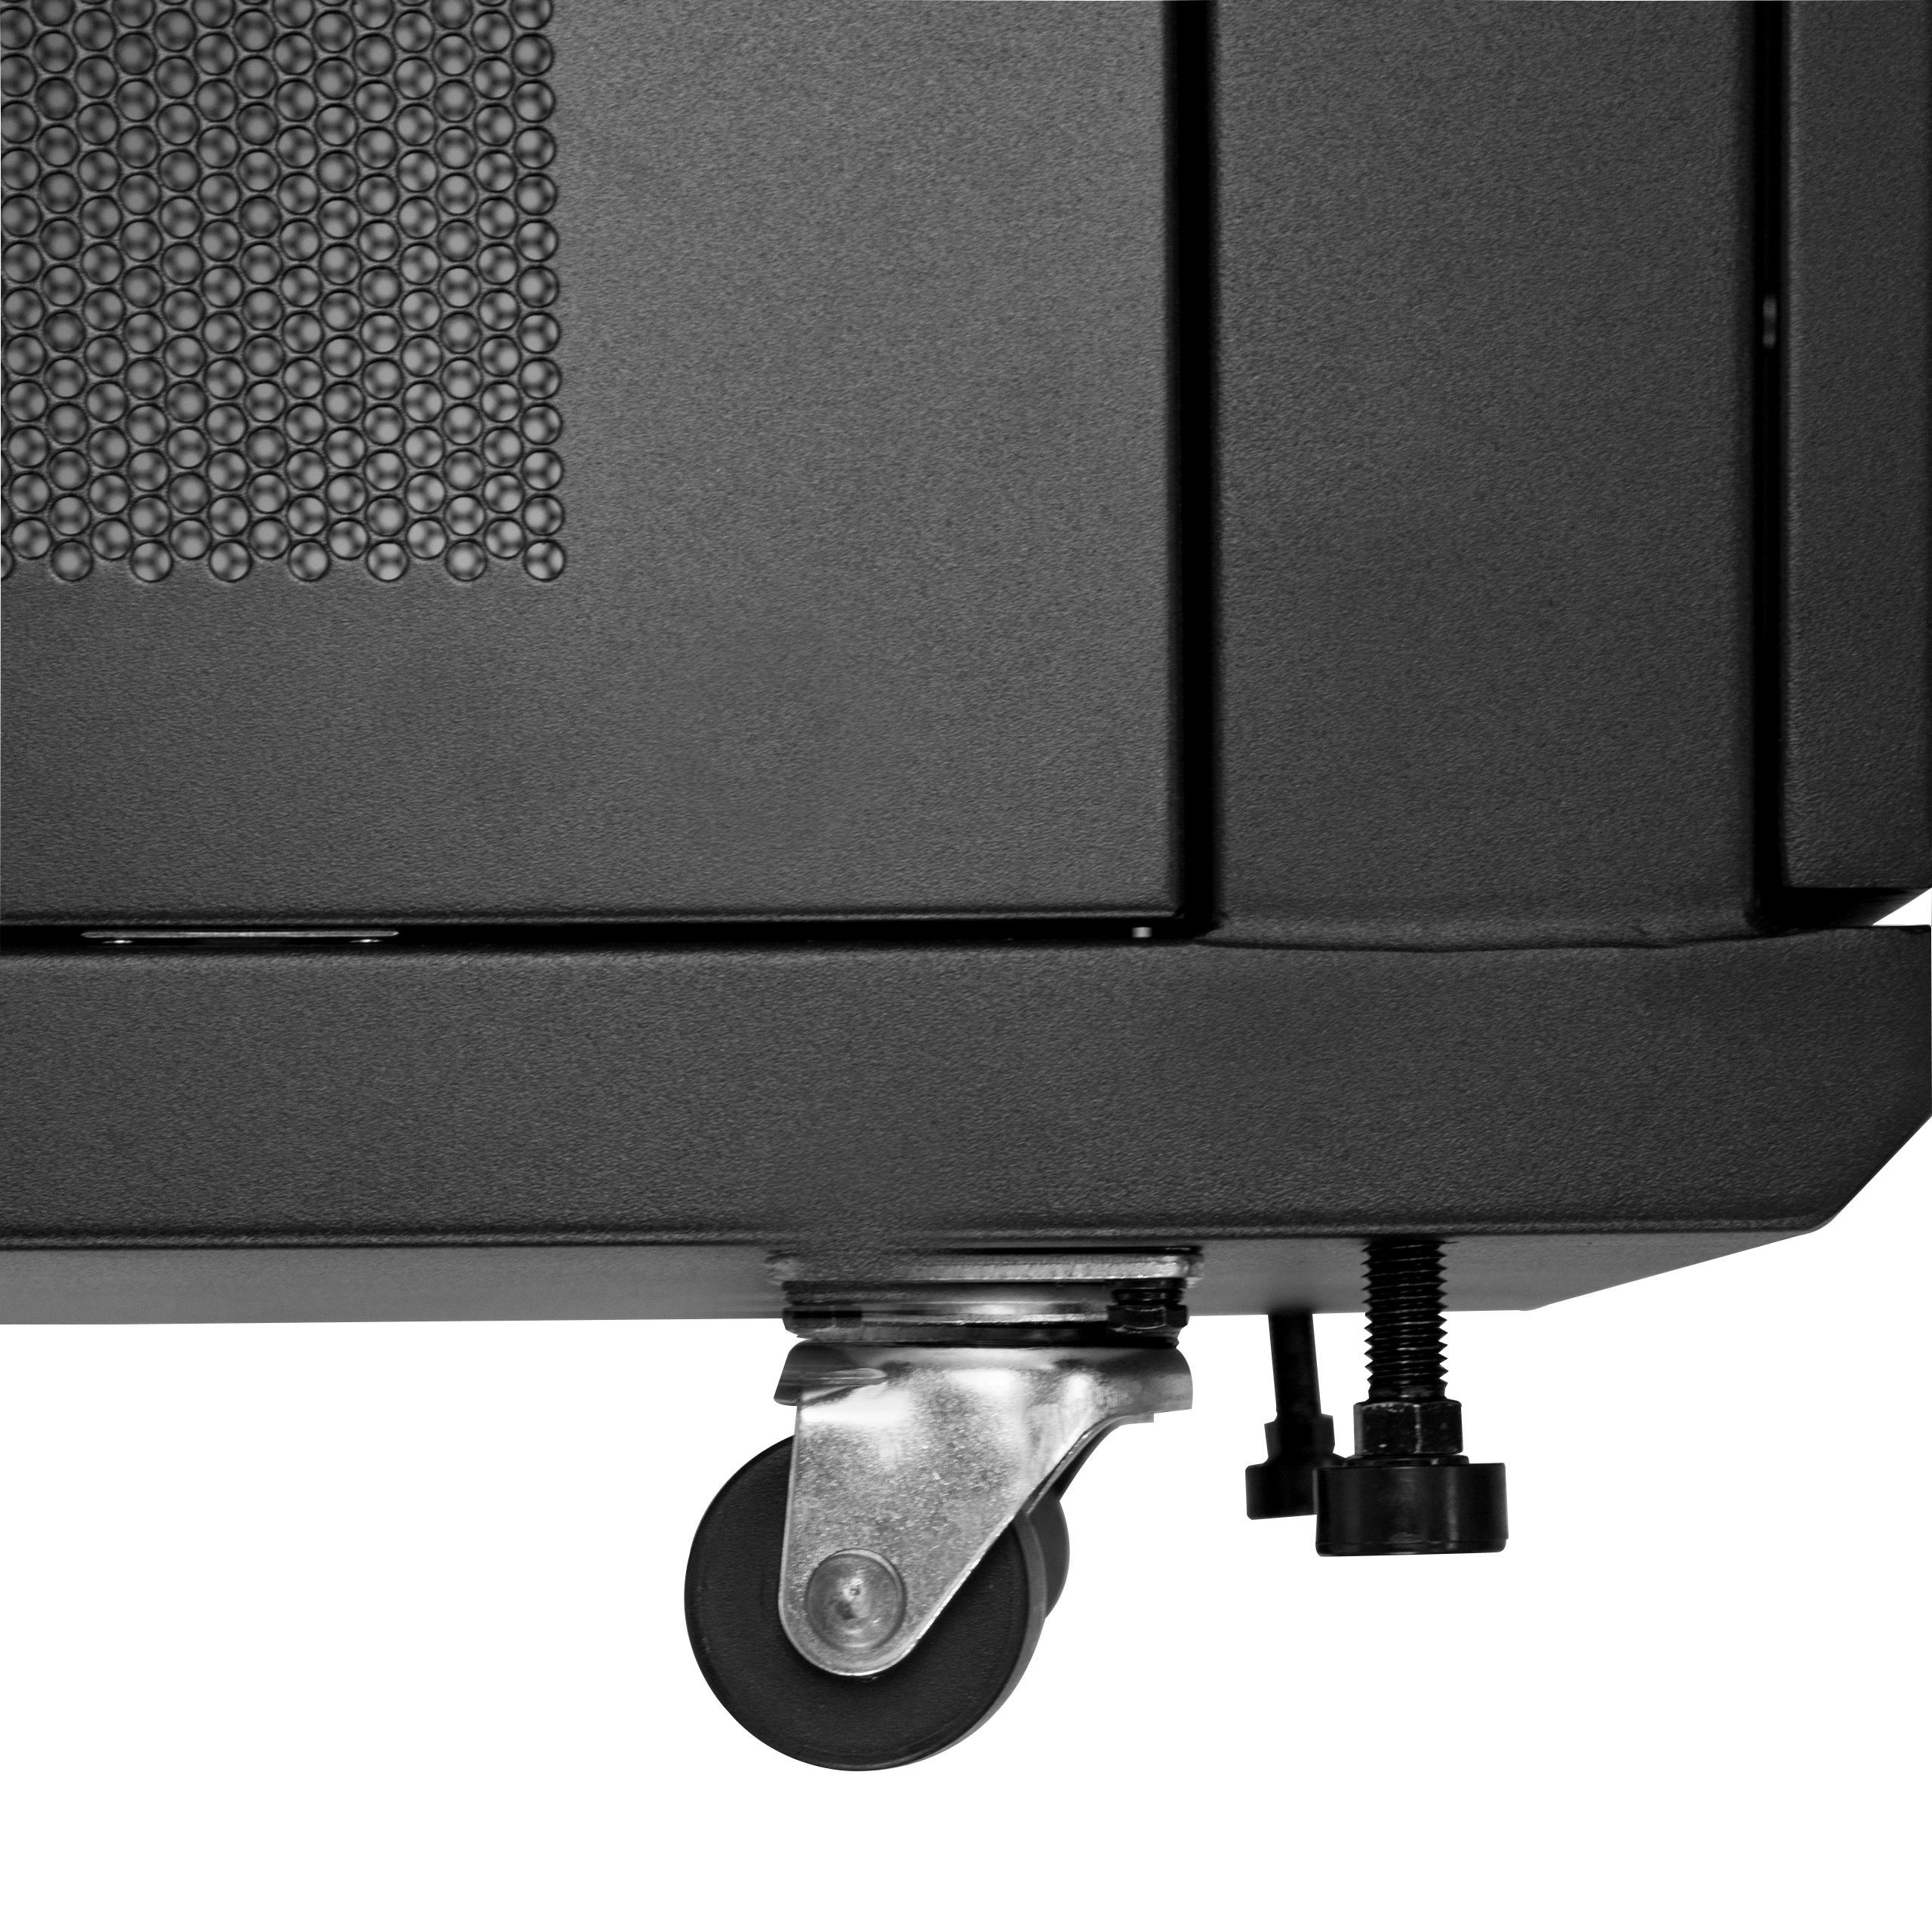 additional product box black store w detail h image rpcs us en server cabinet x d universal